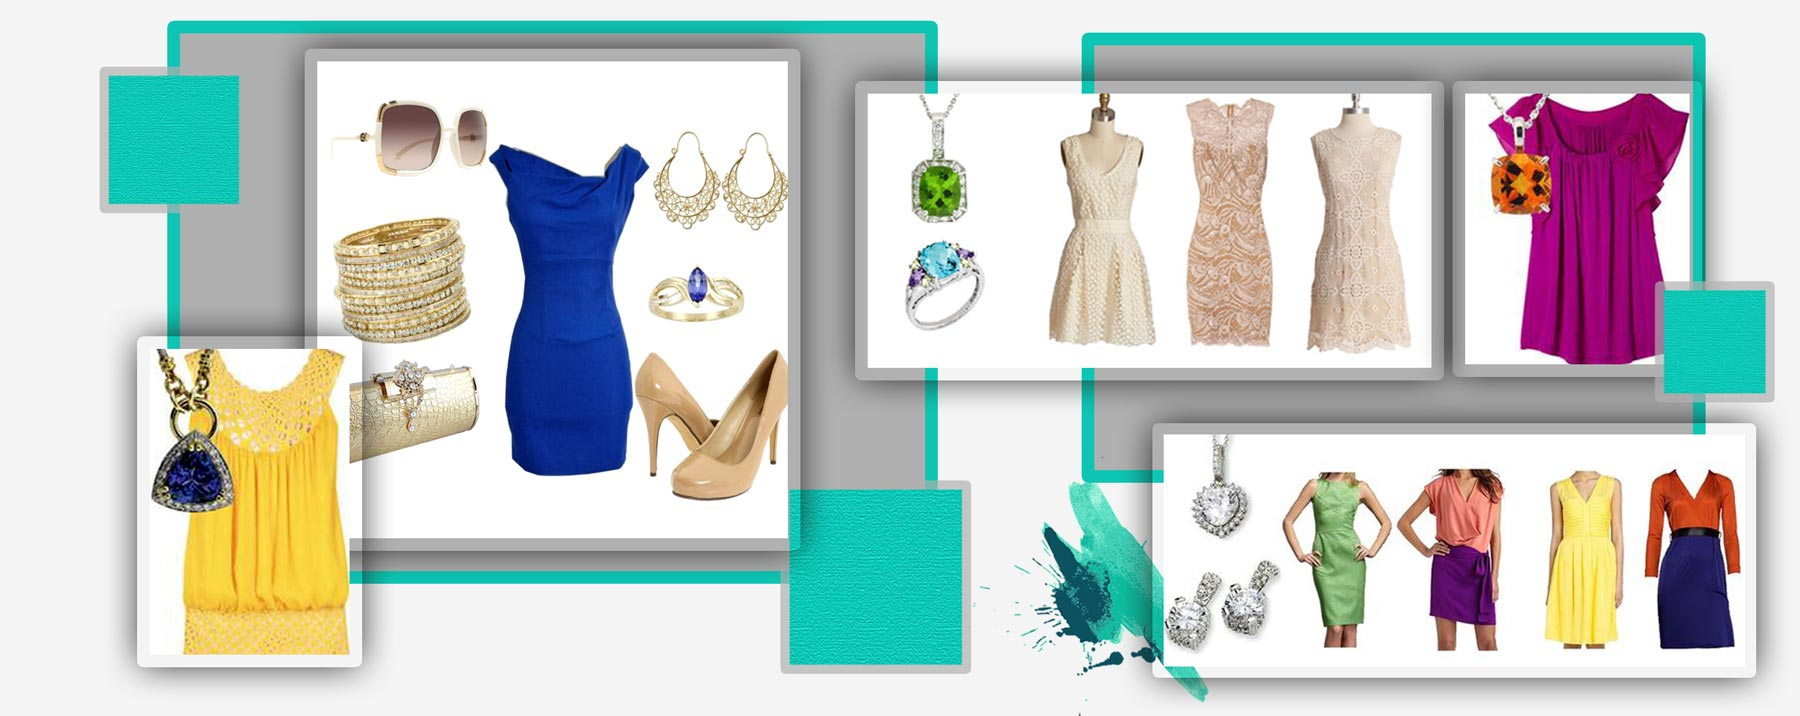 اهمیت ست کردن رنگ لباس و جواهرات